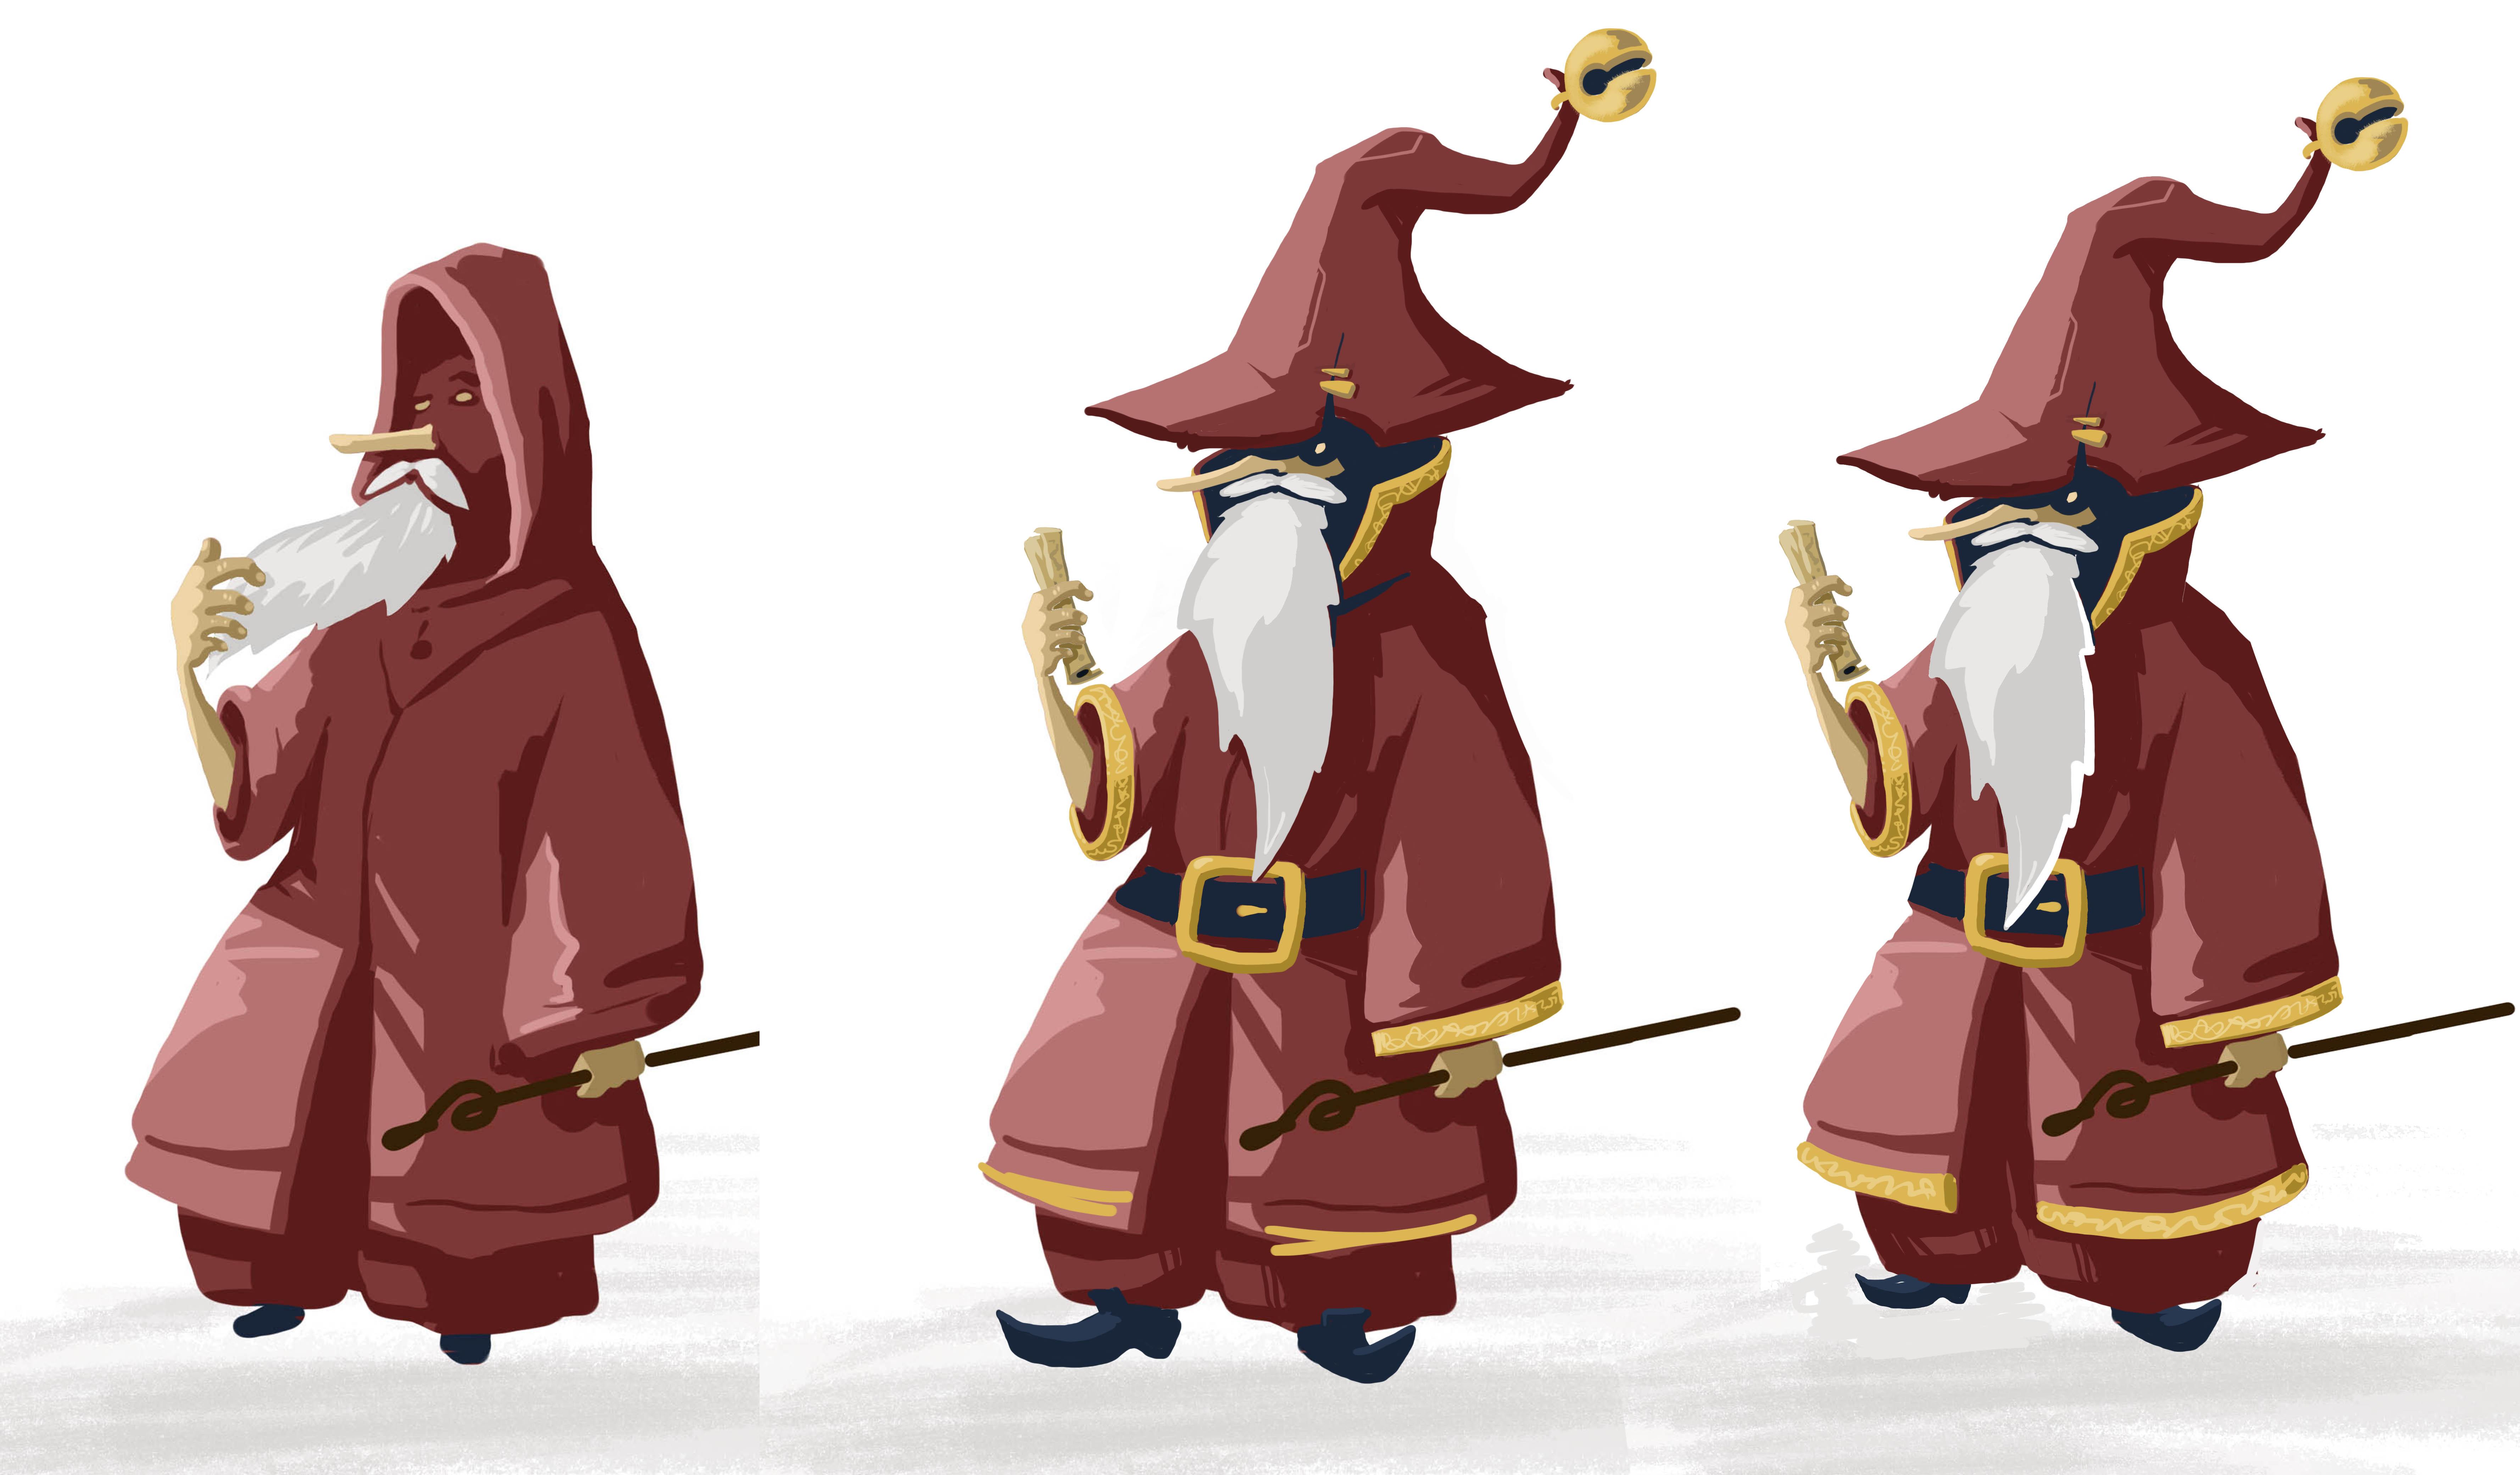 abys-illustration da-lyon rough character